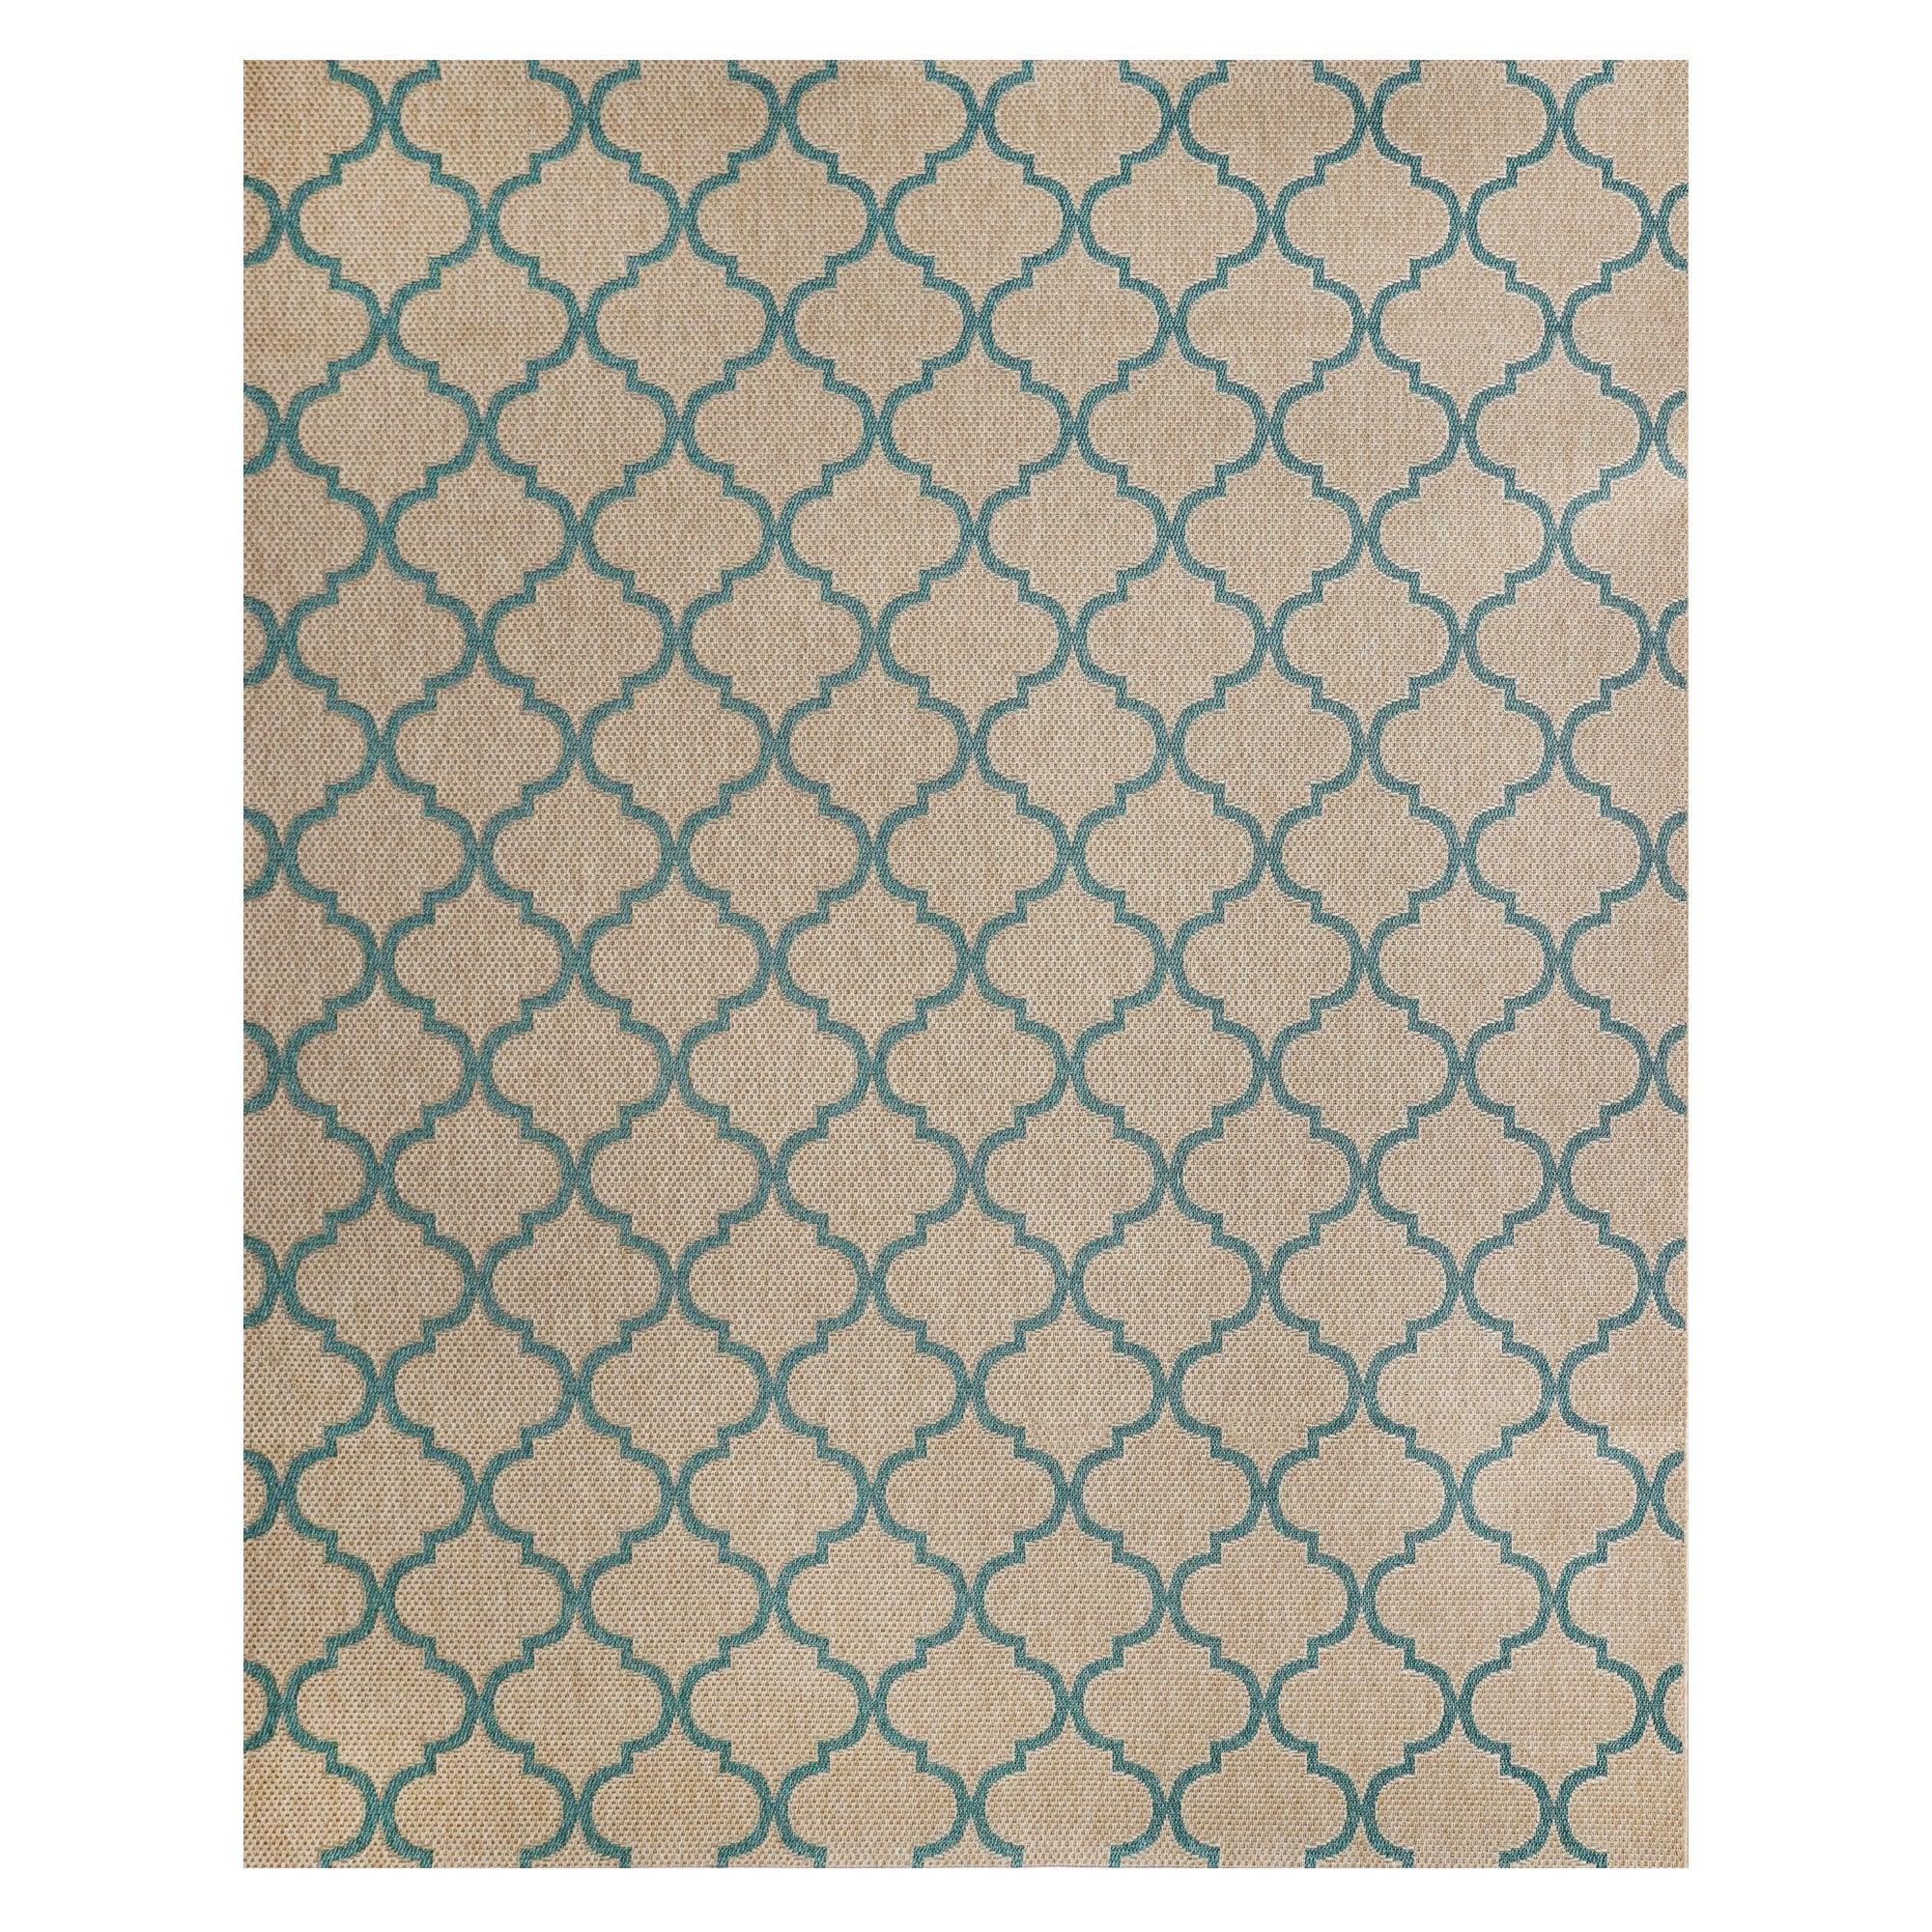 Studio by Brown Jordan Hastings Beige/Turquoise Polypropylene Area Rug (5'3x7'5) - 5'3 x 7'5 (5'3 x 7'5 - Beige/Turquoise)